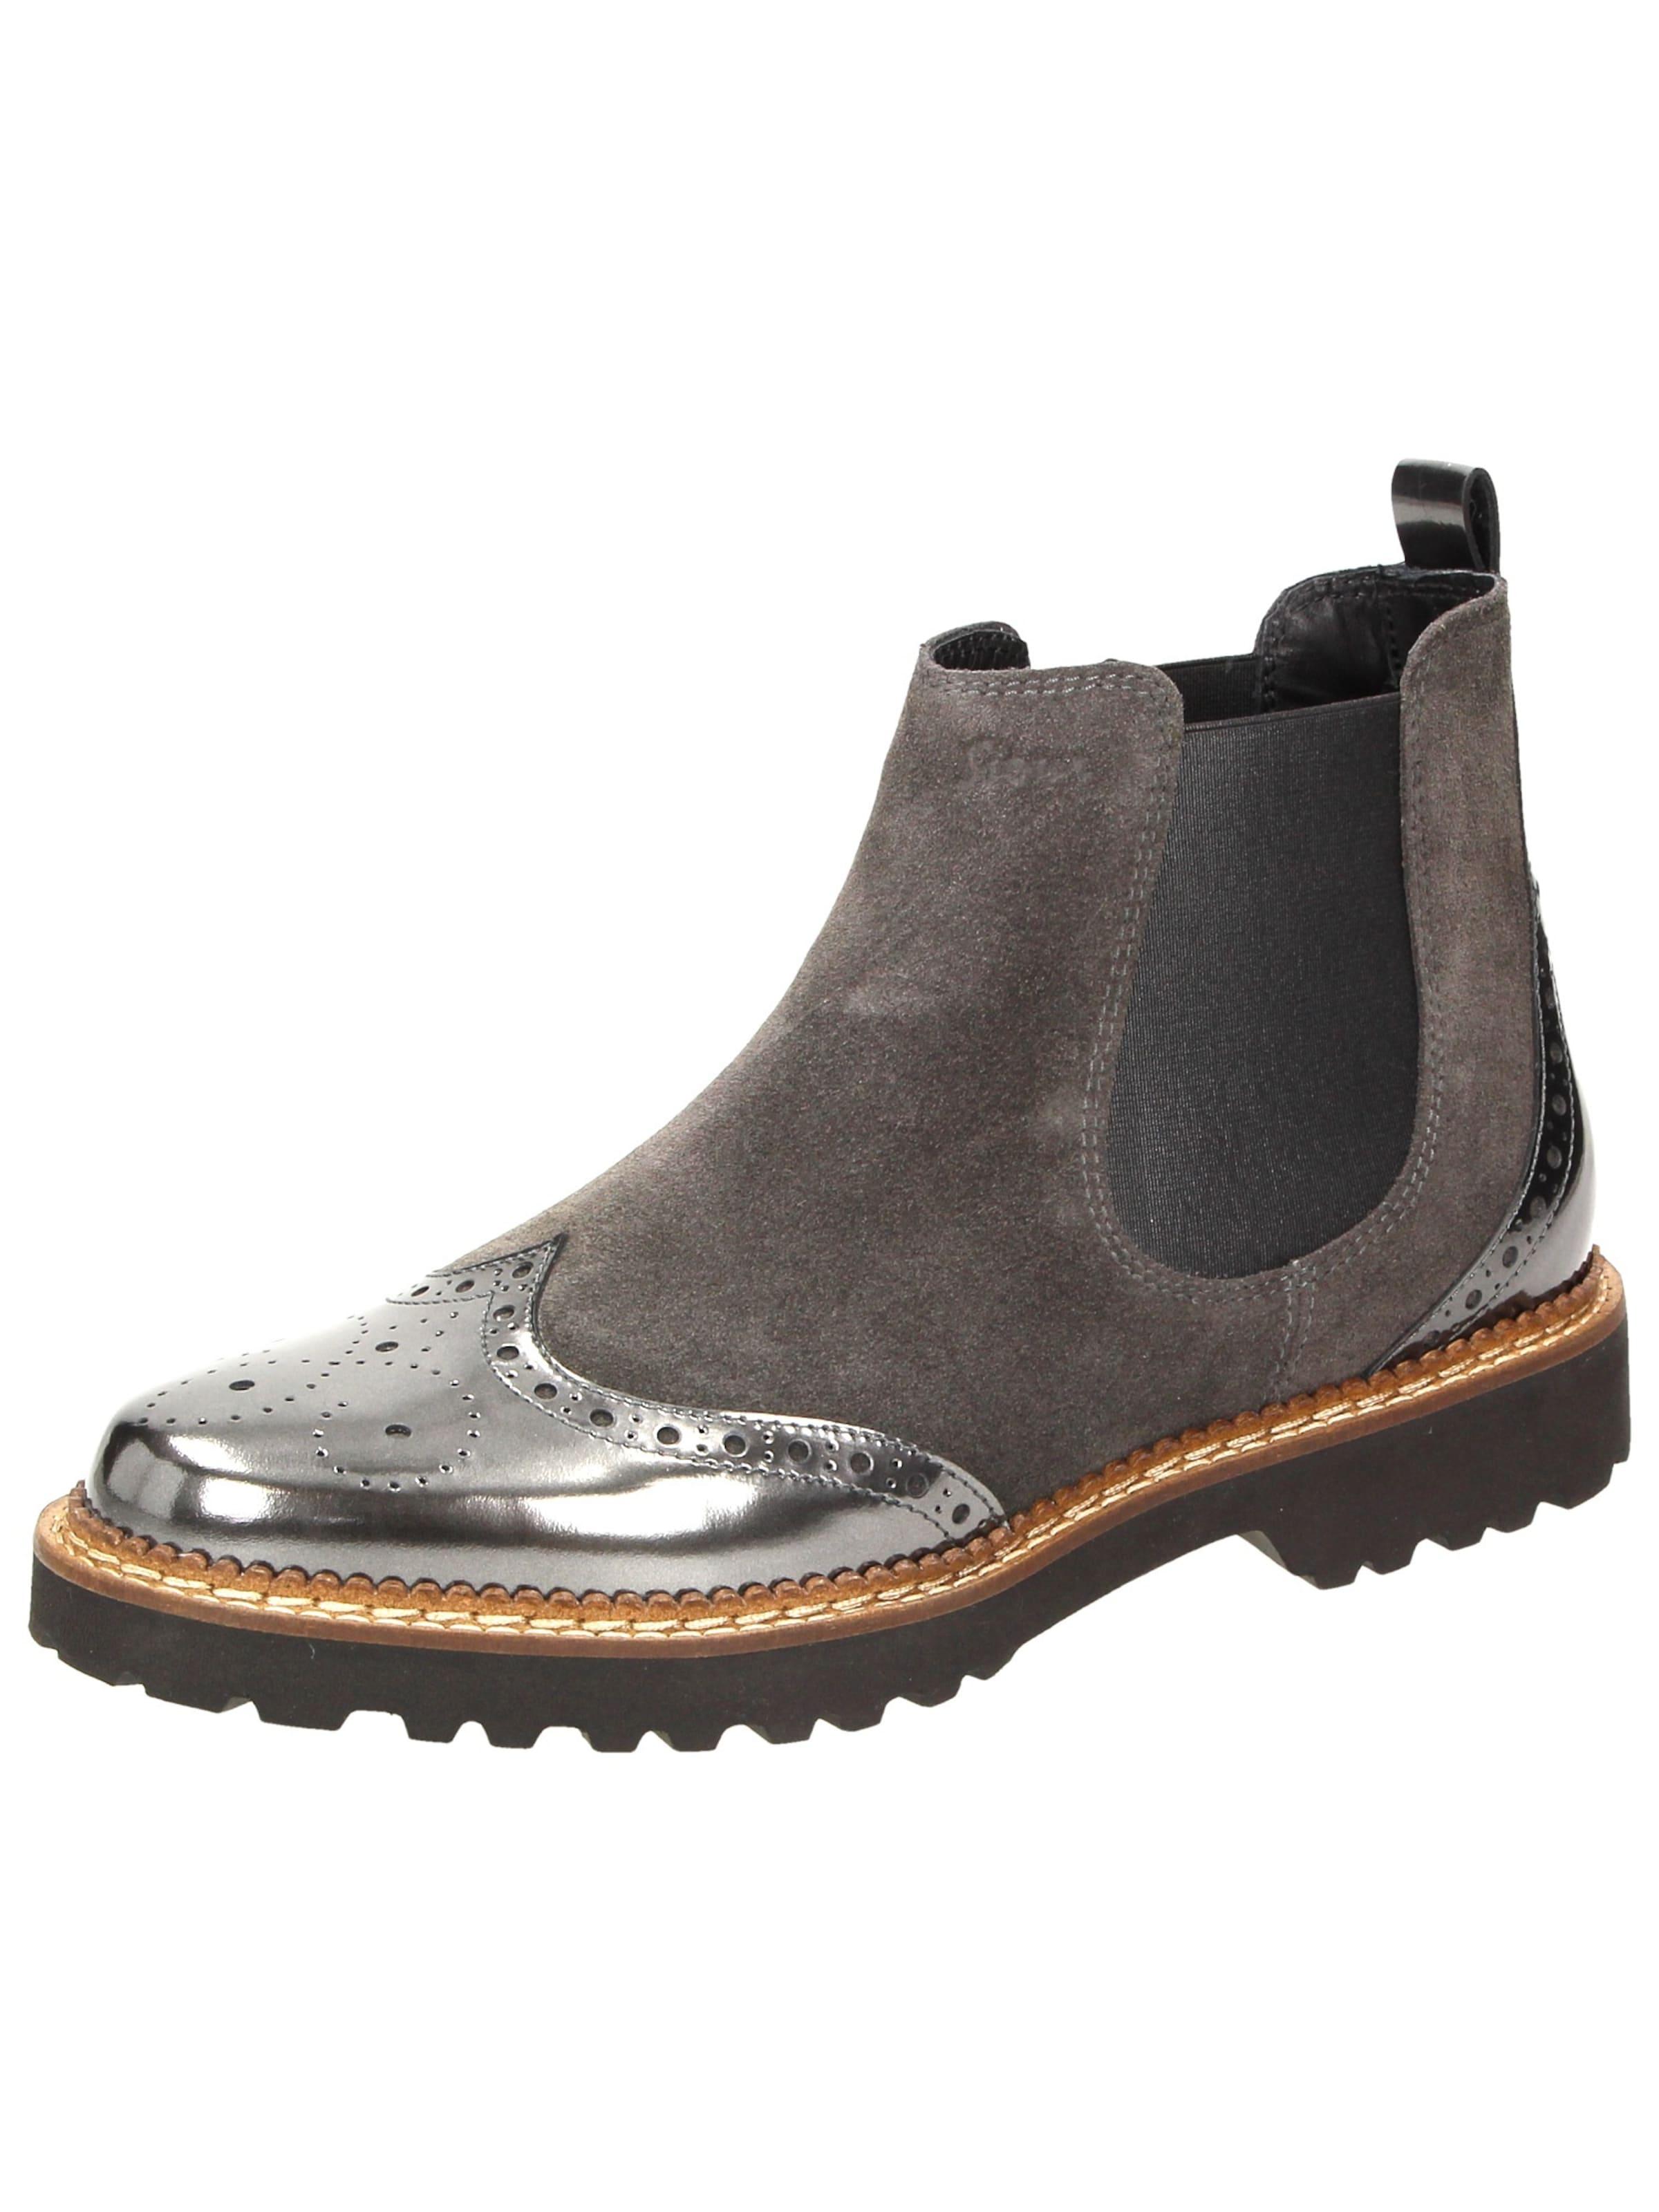 Haltbare Mode billige Schuhe SIOUX   Stiefelette 'Veselka' Schuhe Gut getragene Schuhe